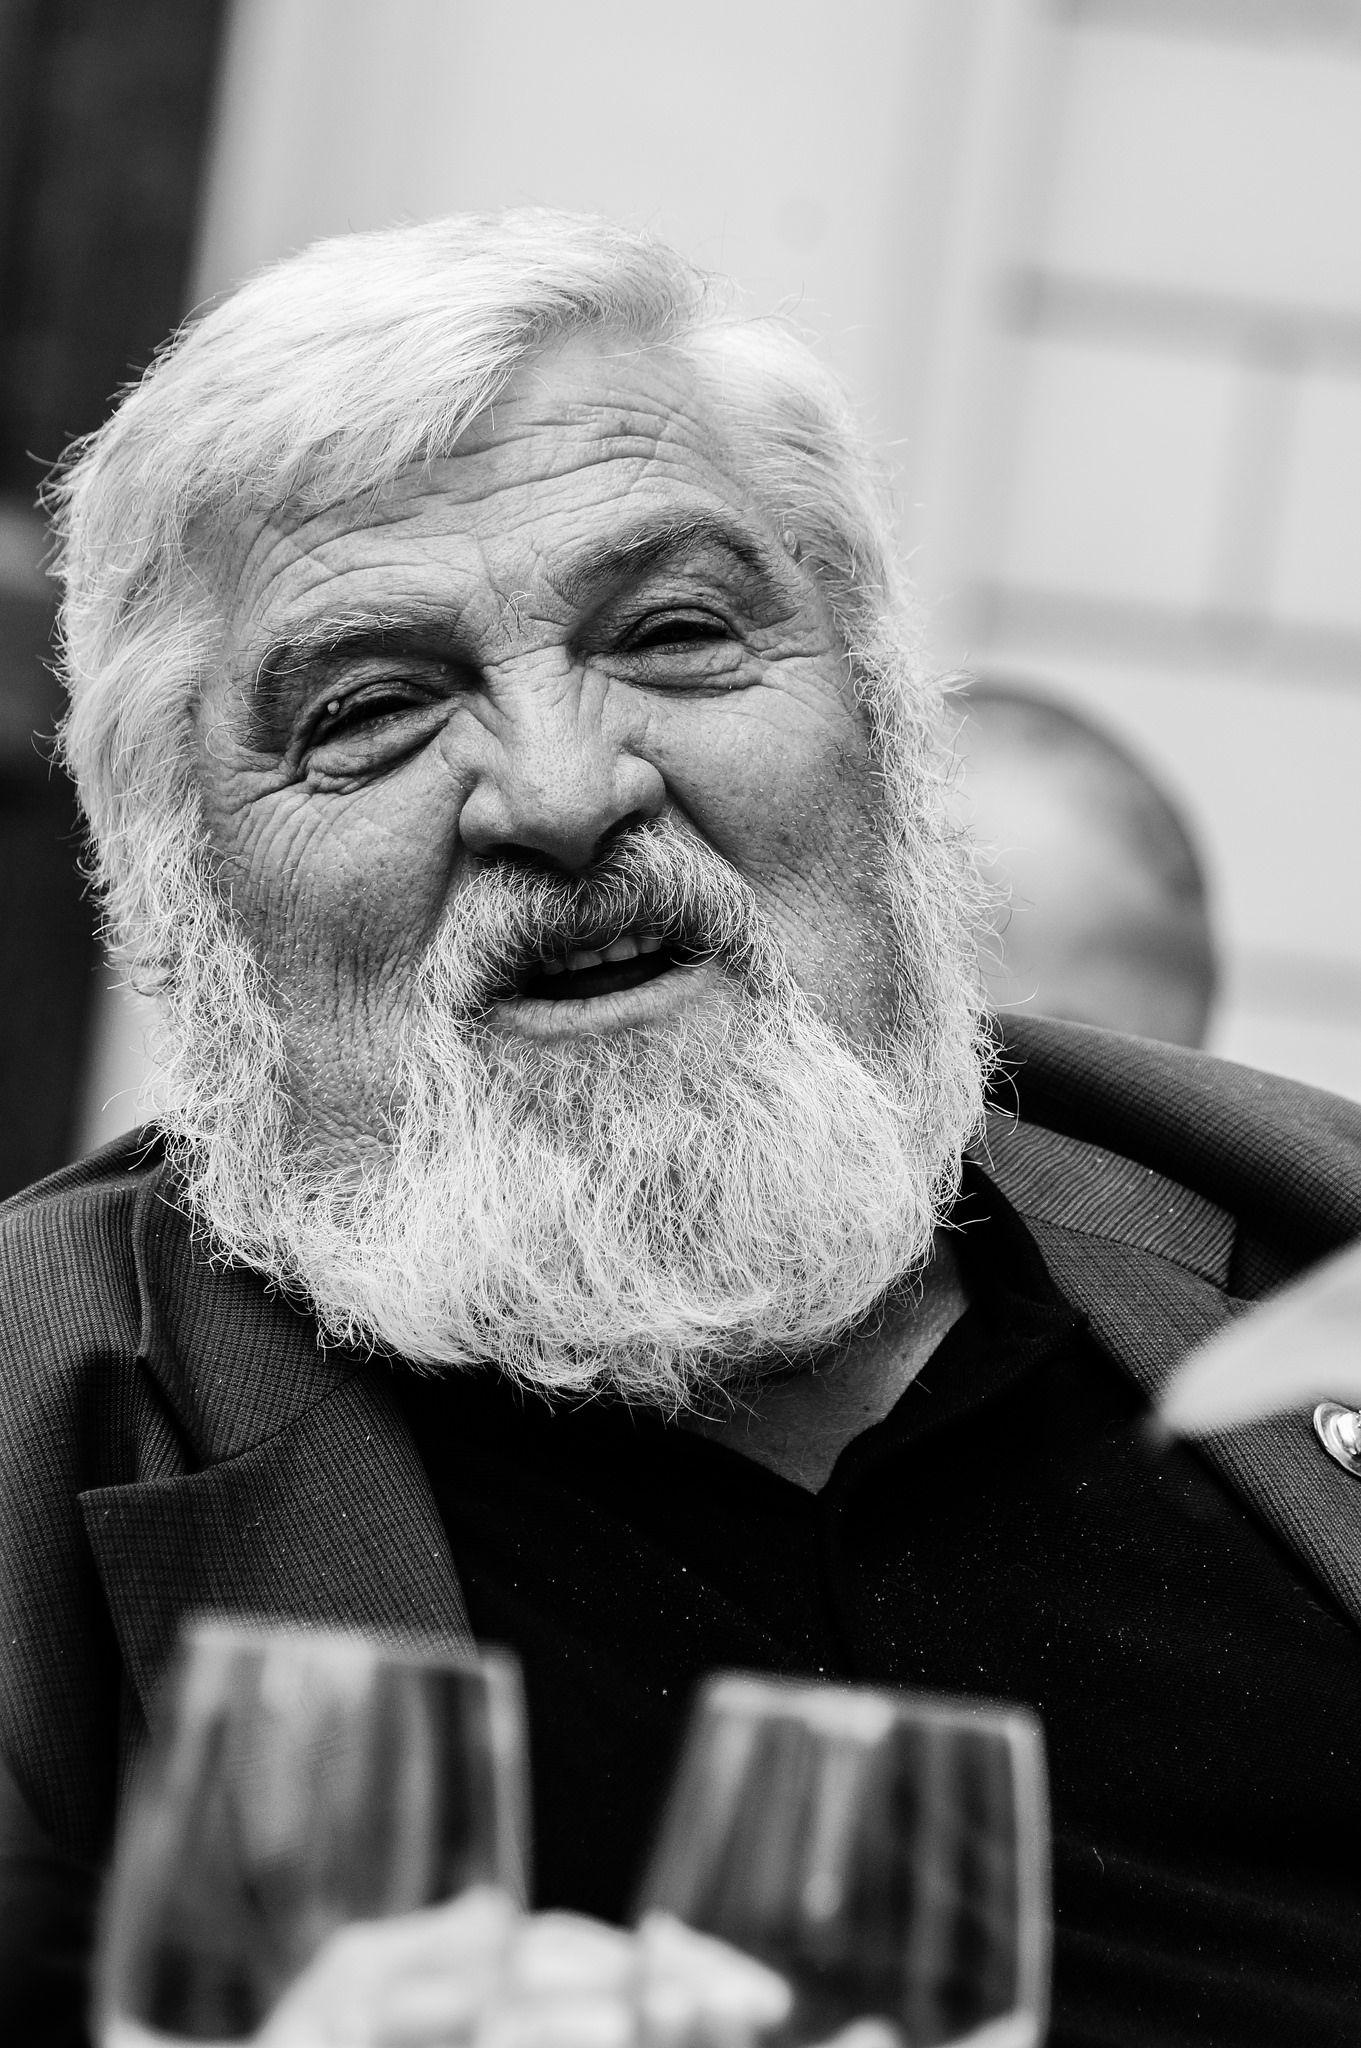 https://flic.kr/p/jCpMSm | Babbo Natale in vacanza...Santa Claus in vacation....